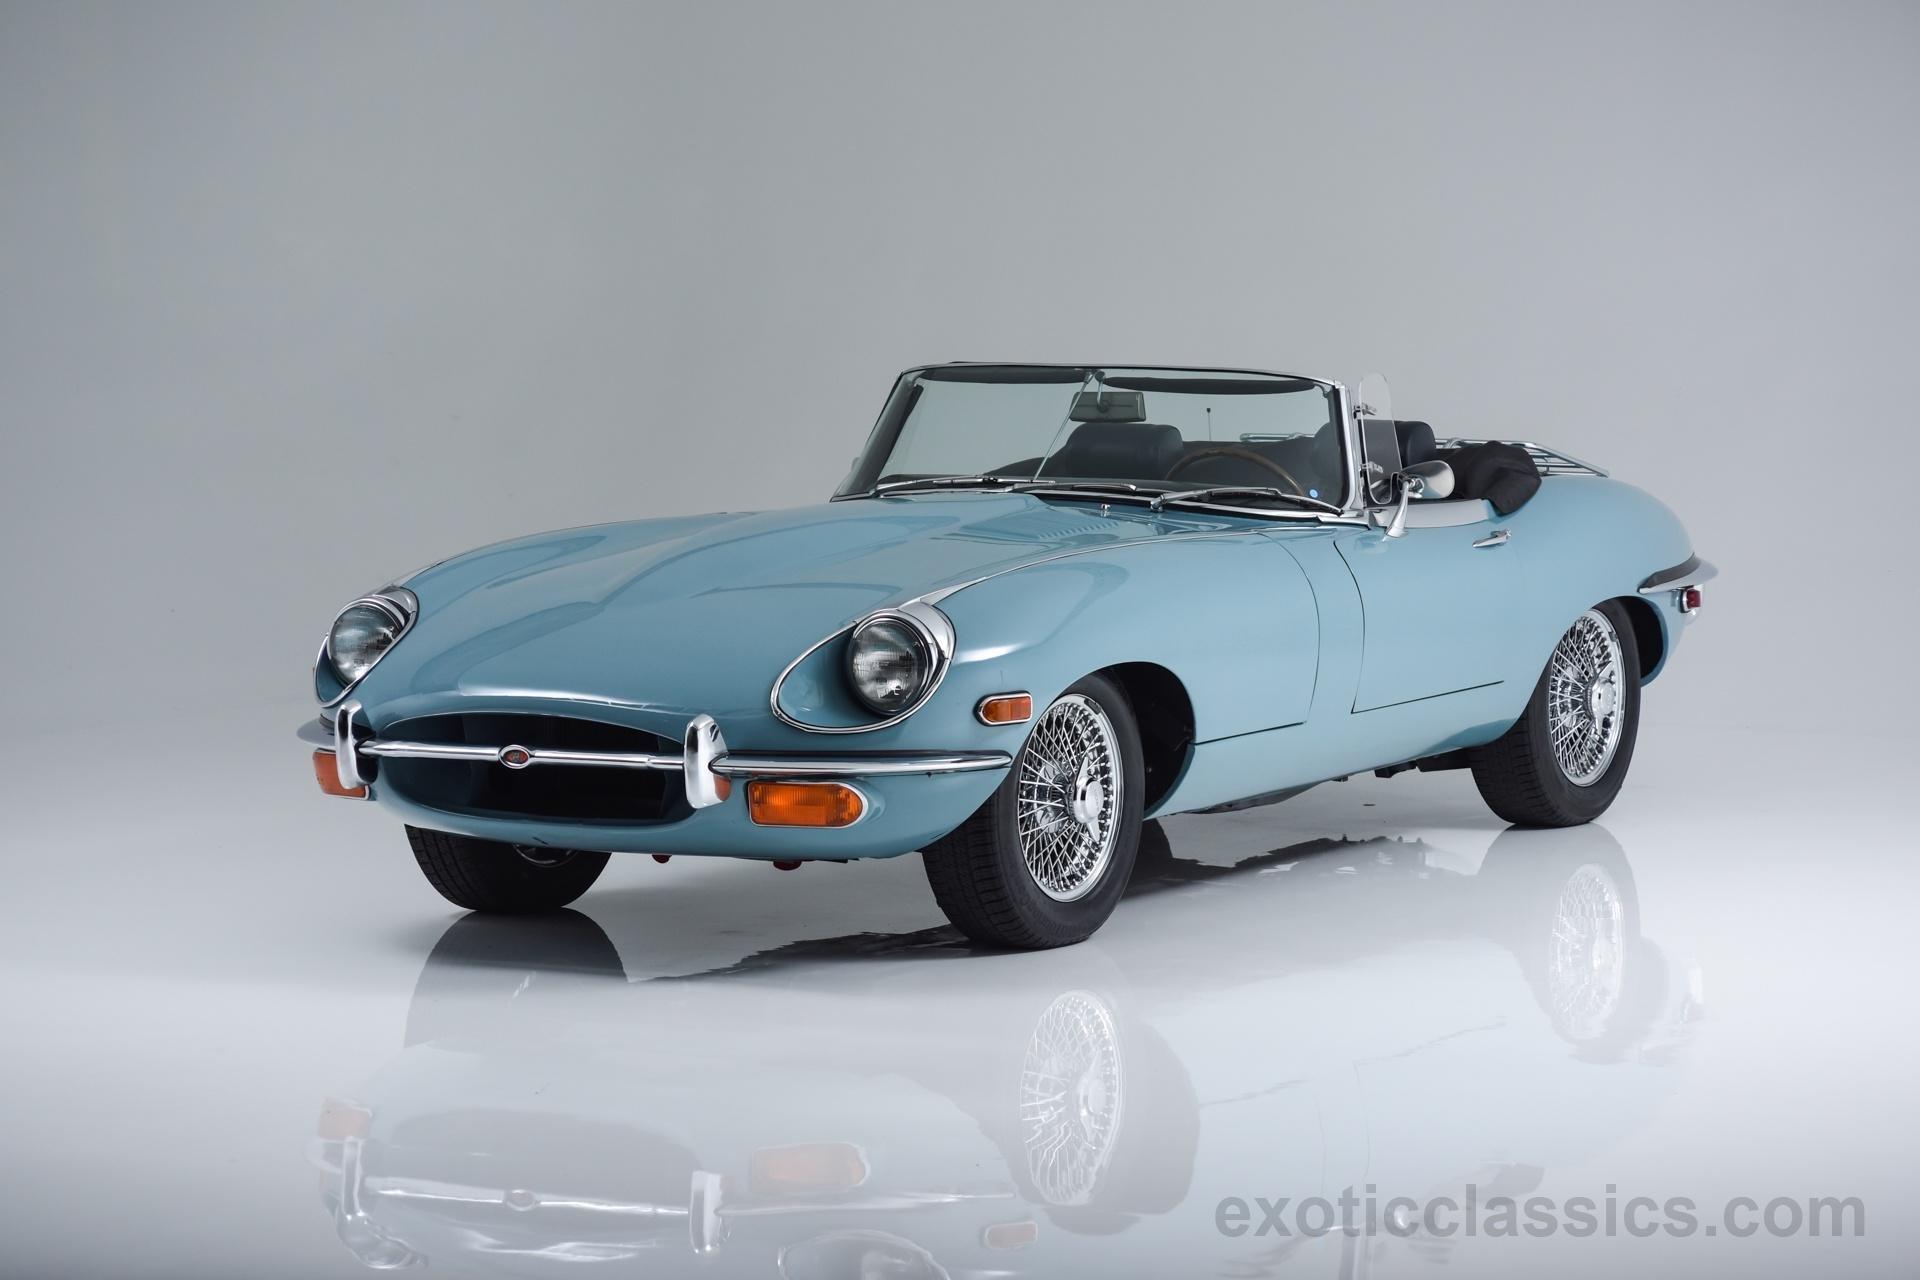 1969 Jaguar Xke Convertible Cars Classic Blue Wallpaper 1920x1280 701892 Wallpaperup